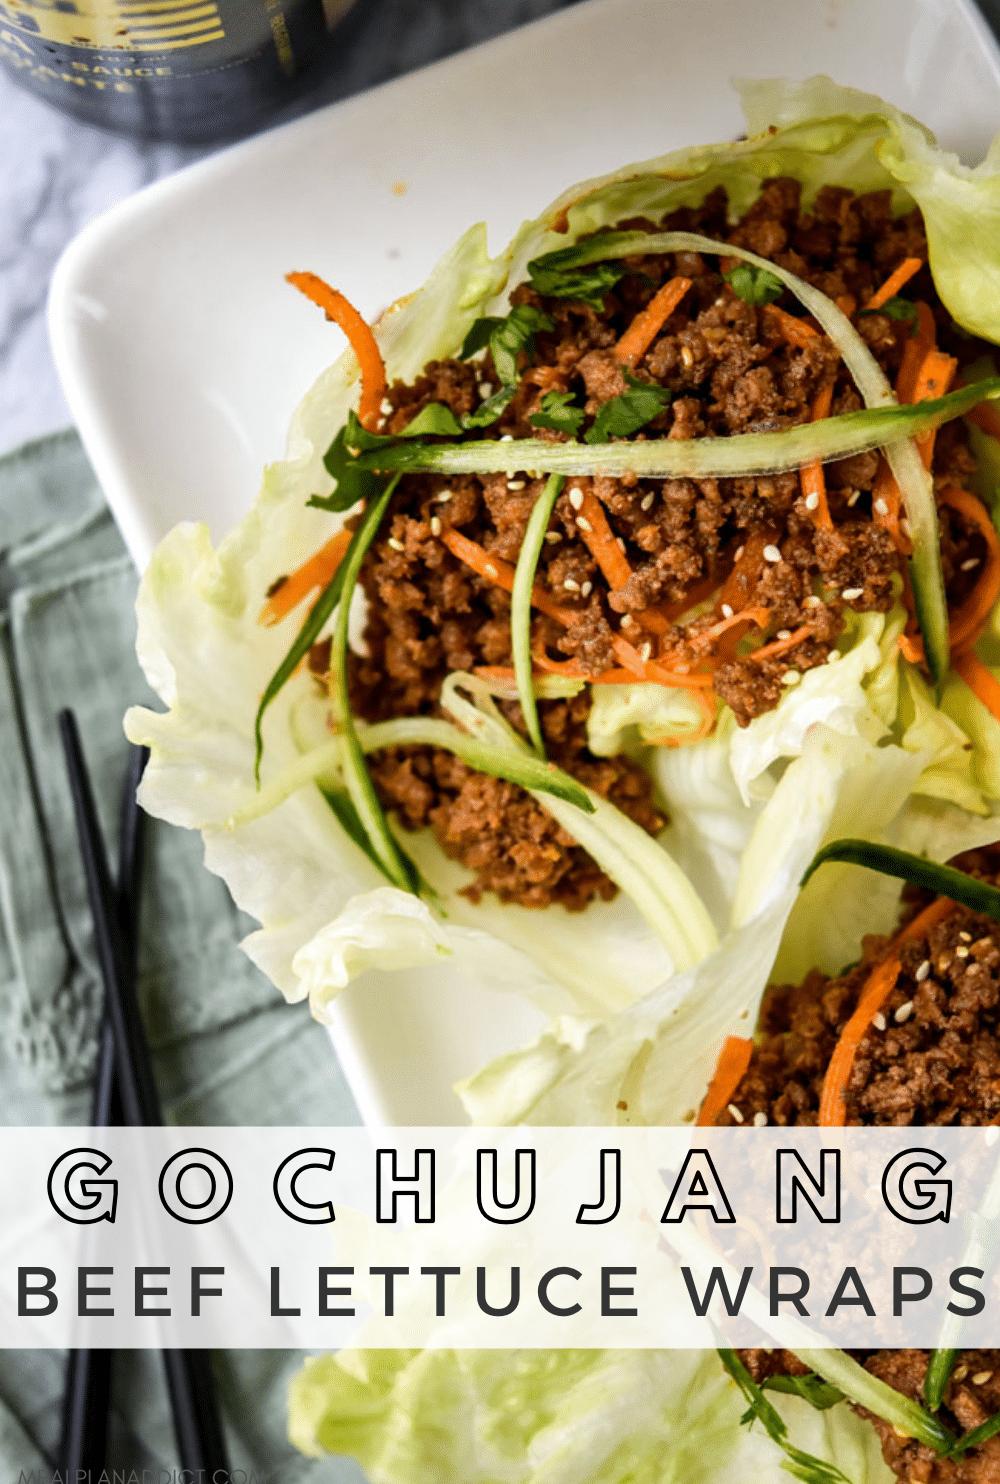 Easy Dinner Gochujang Beef Lettuce Wraps   Meal Plan Addict